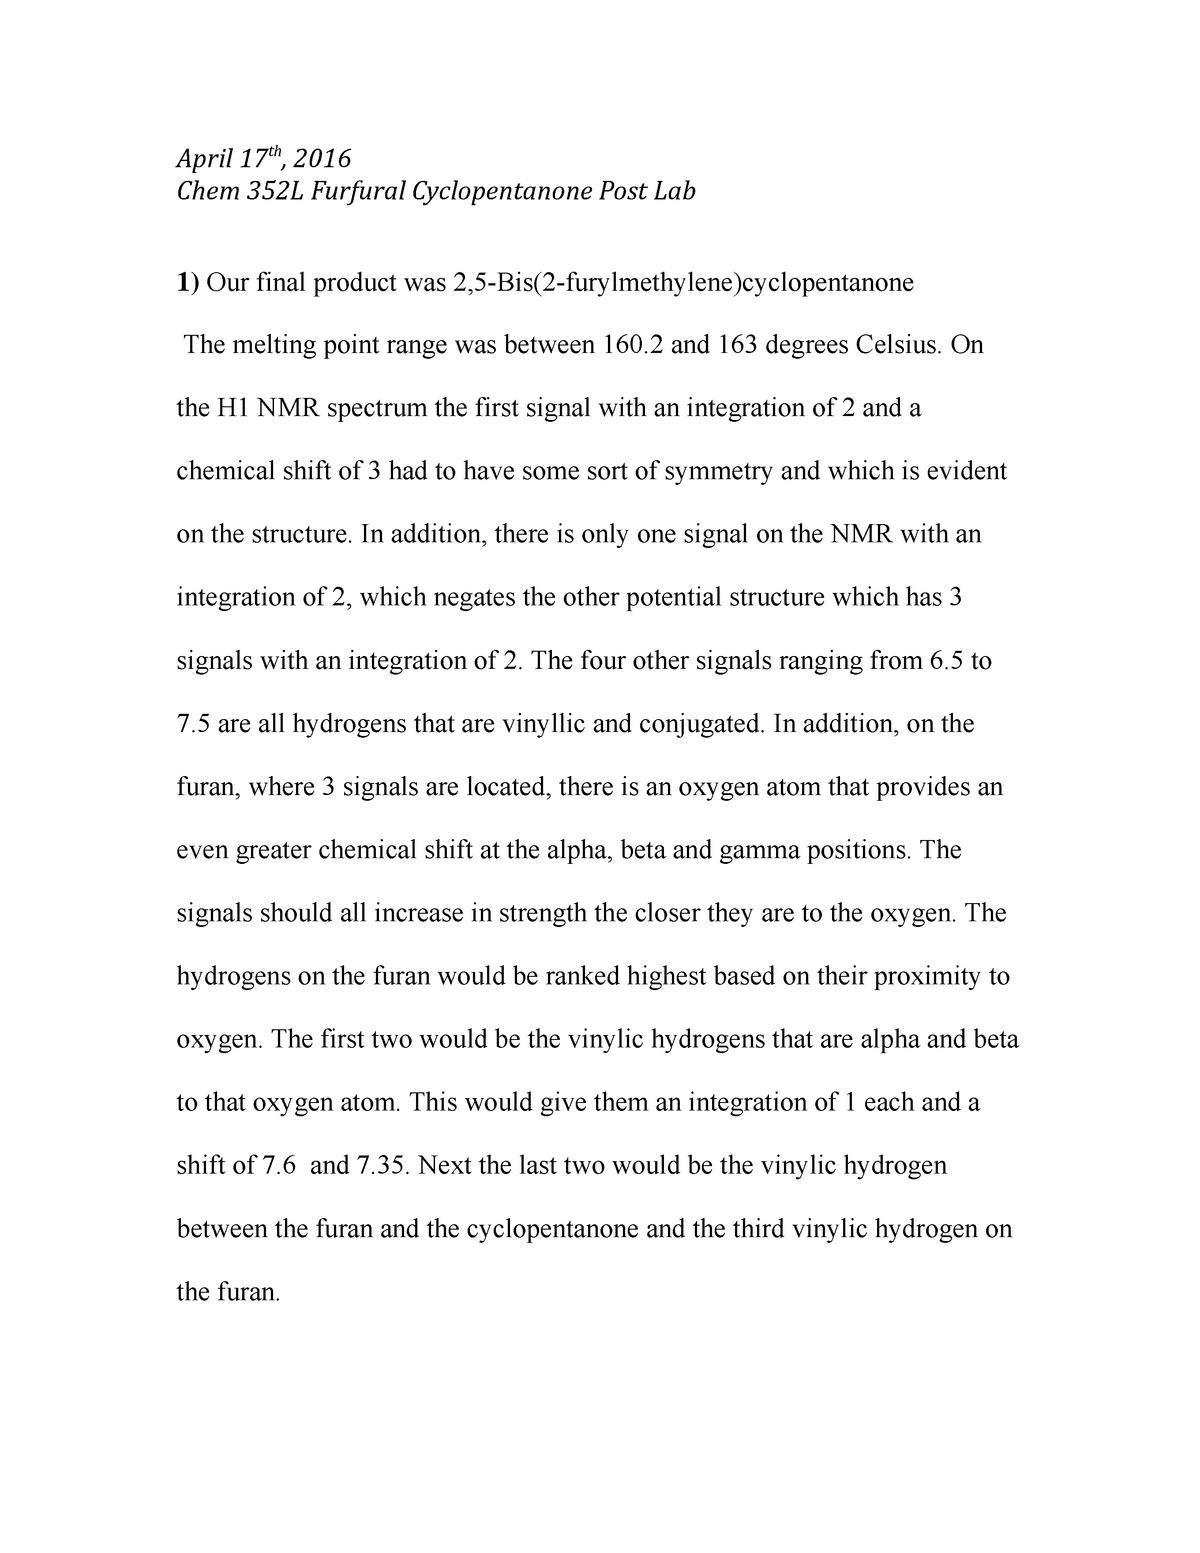 Furfural post lab - lab report - CHEM 352L : Organic Chemistry